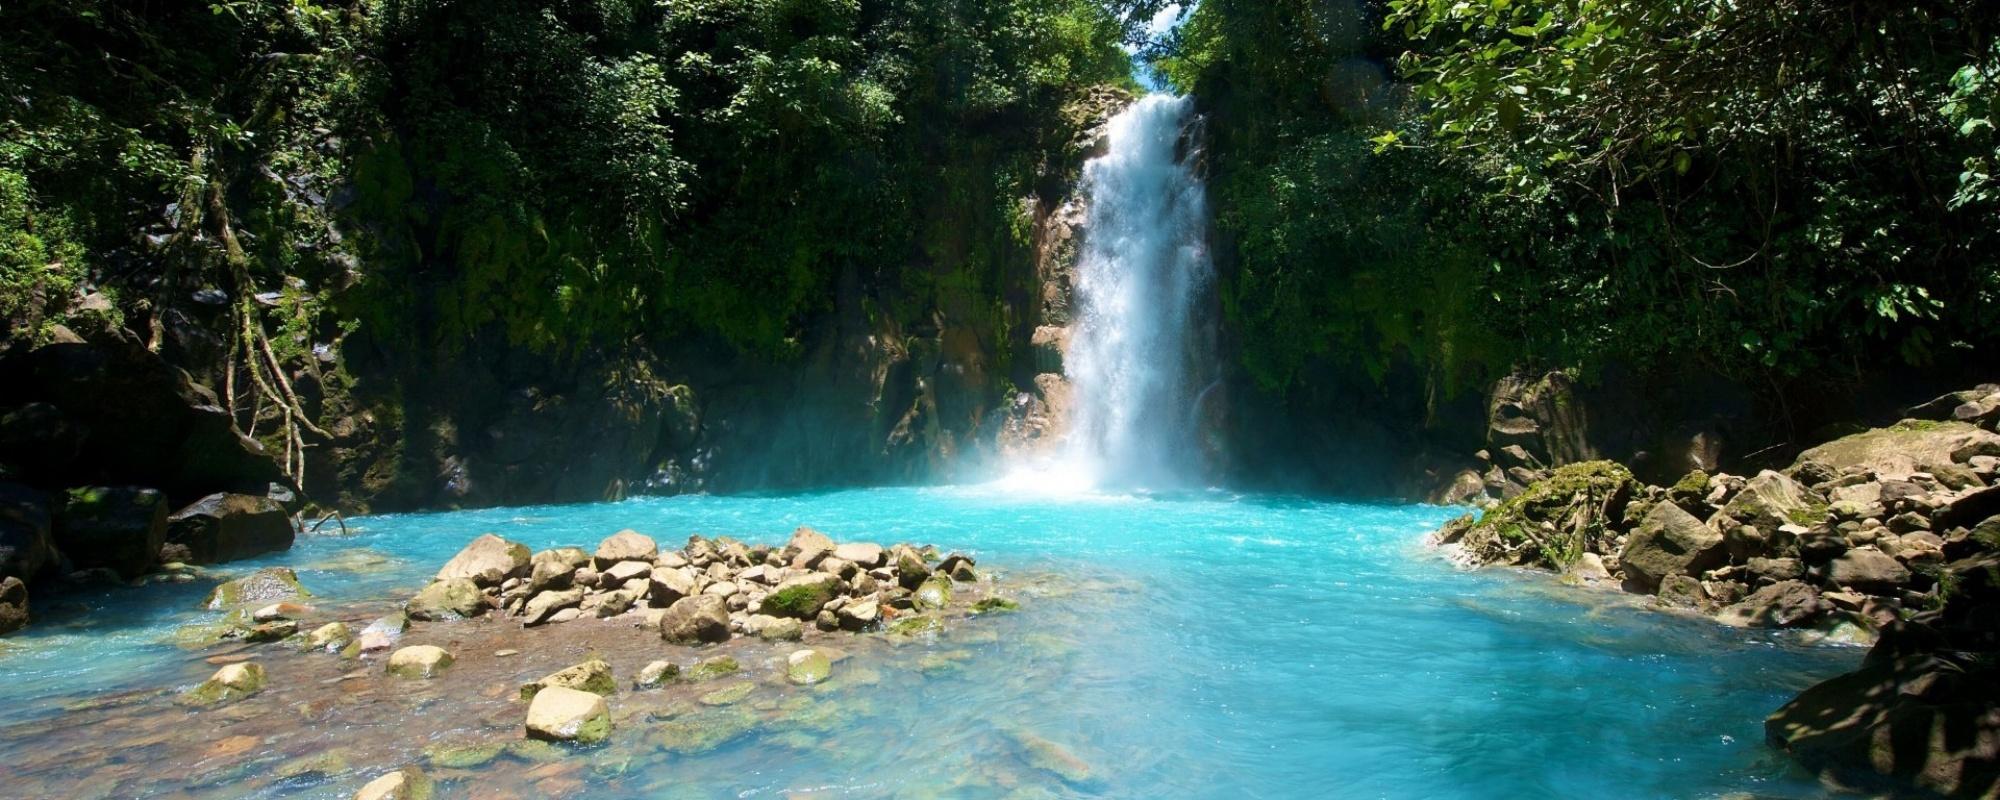 waterfalls_costa_rica